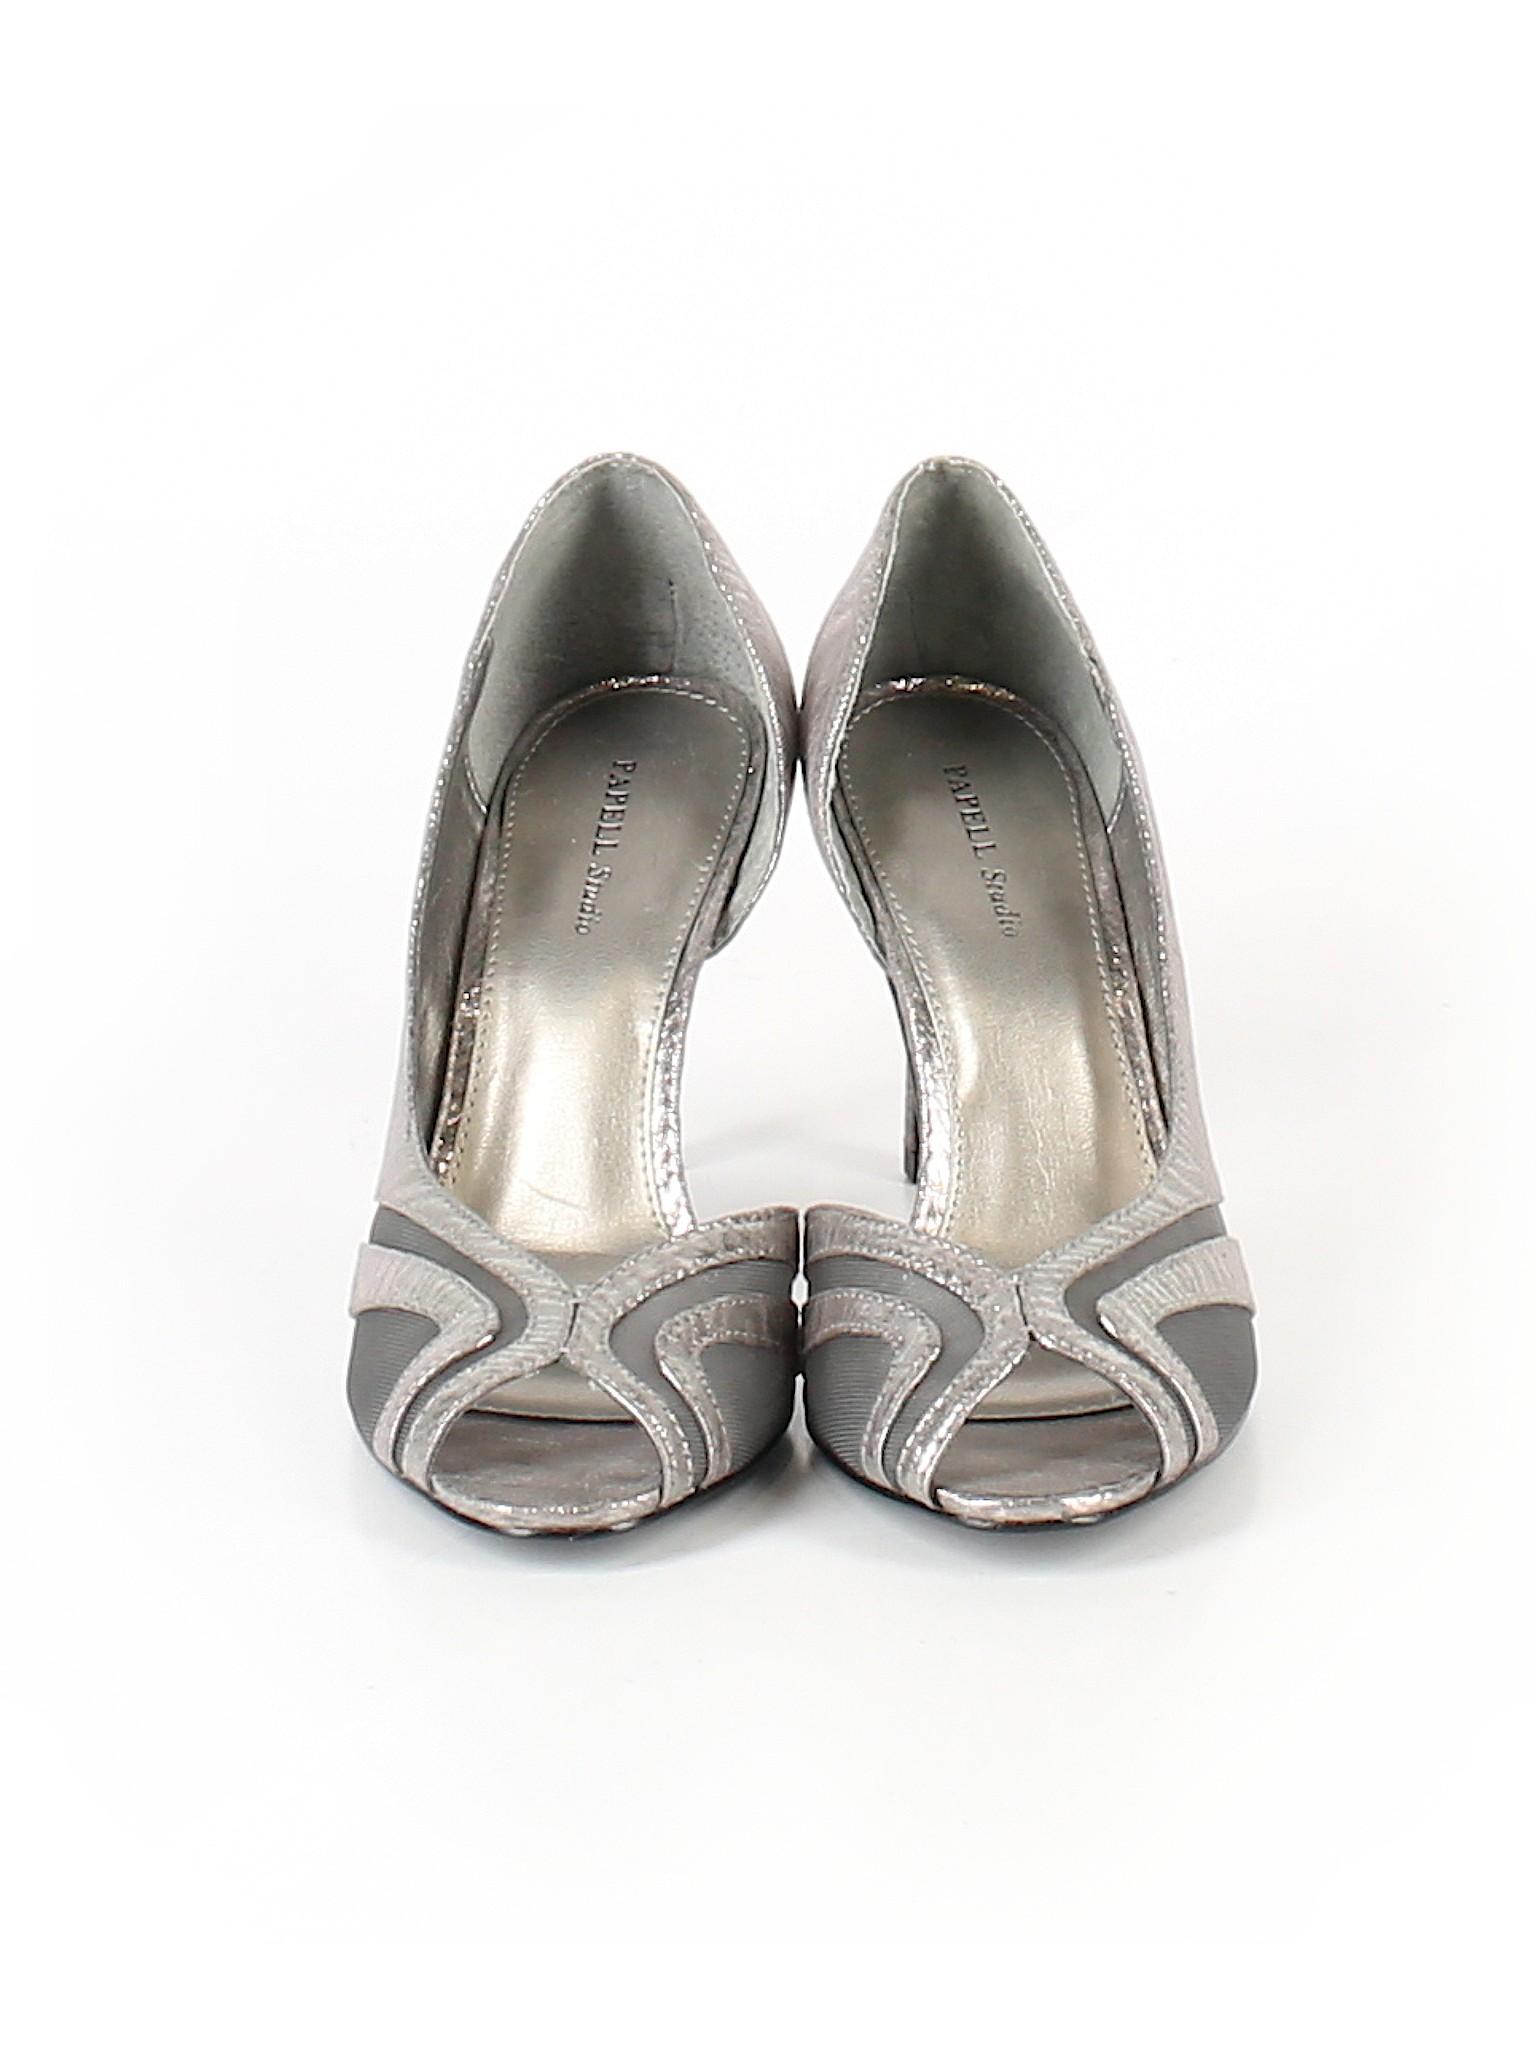 promotion Boutique promotion Papell promotion Heels Heels Heels Papell Papell Boutique Papell Boutique promotion Heels Boutique EqCpwzxaw